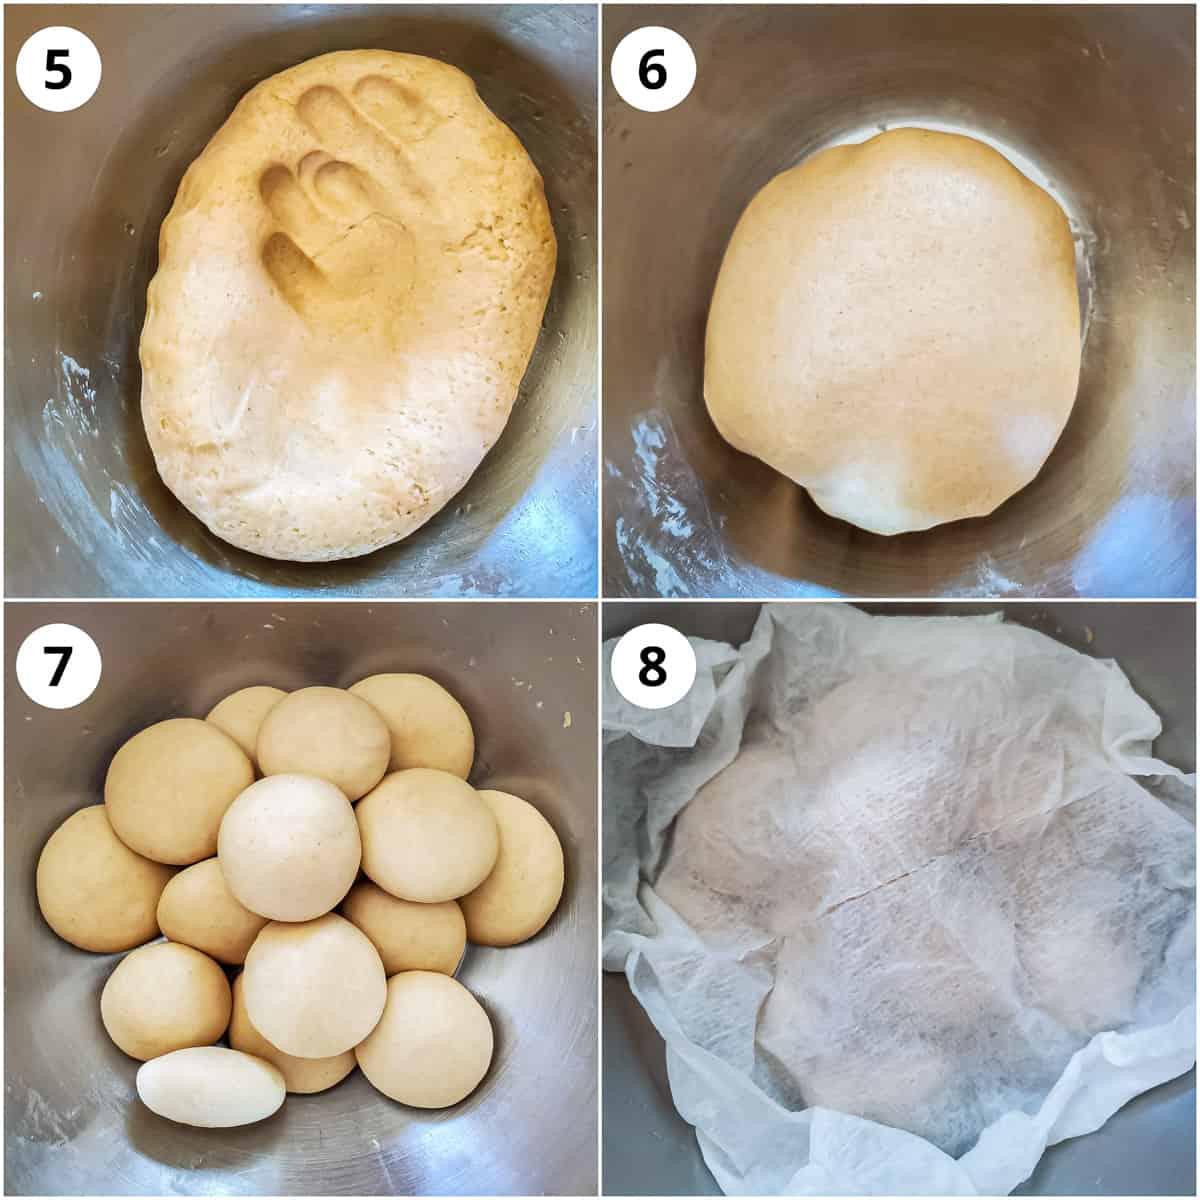 Kneading poori dough again and making balls